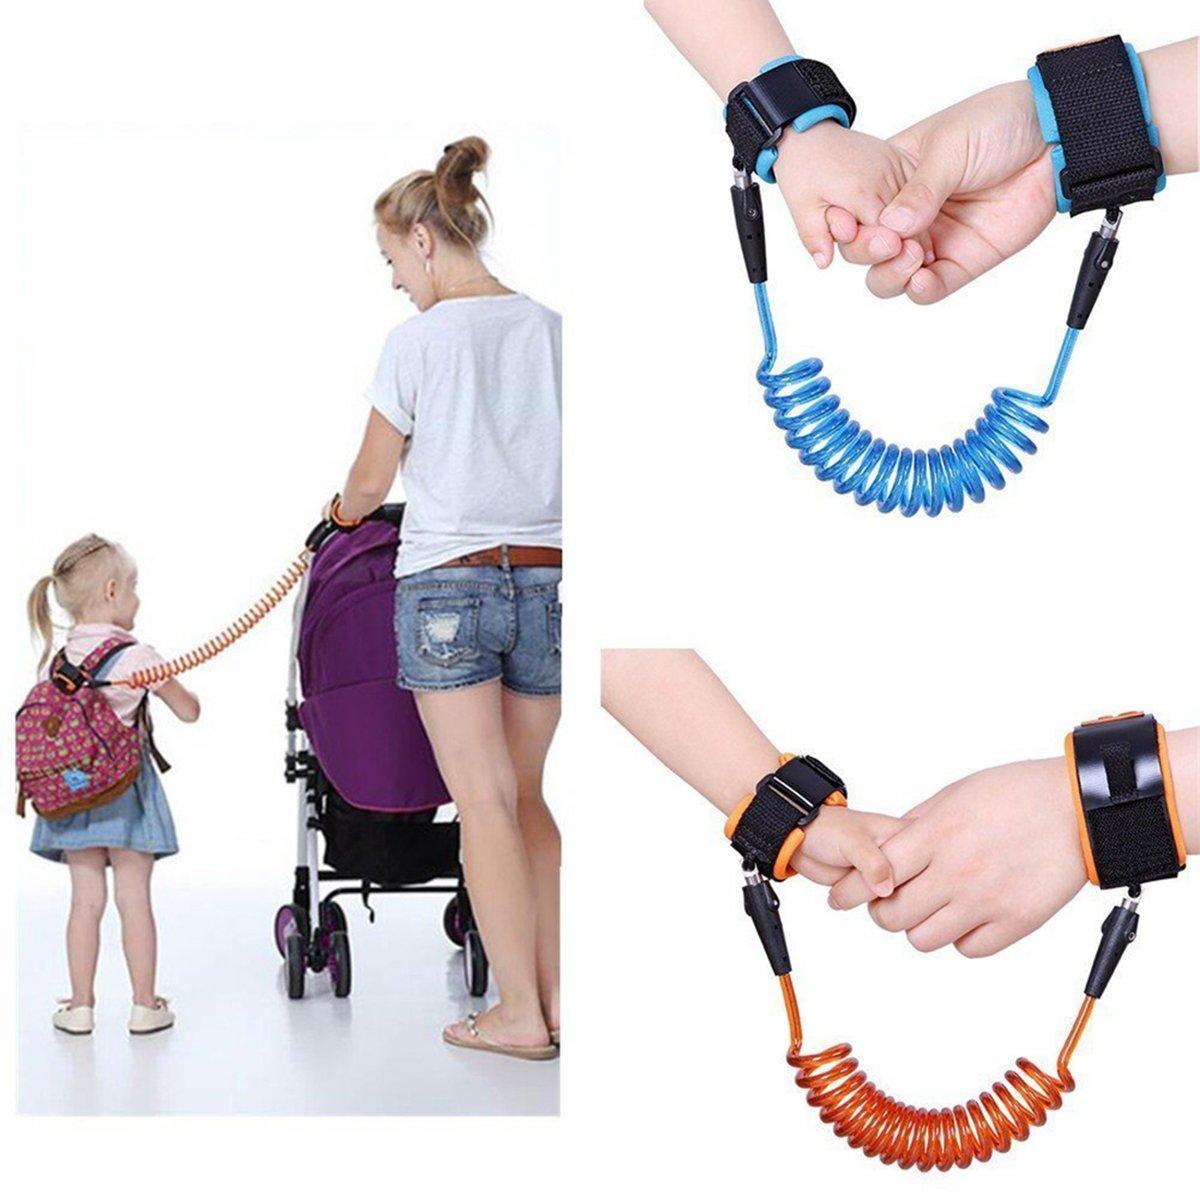 Wrist Link Harness Strap